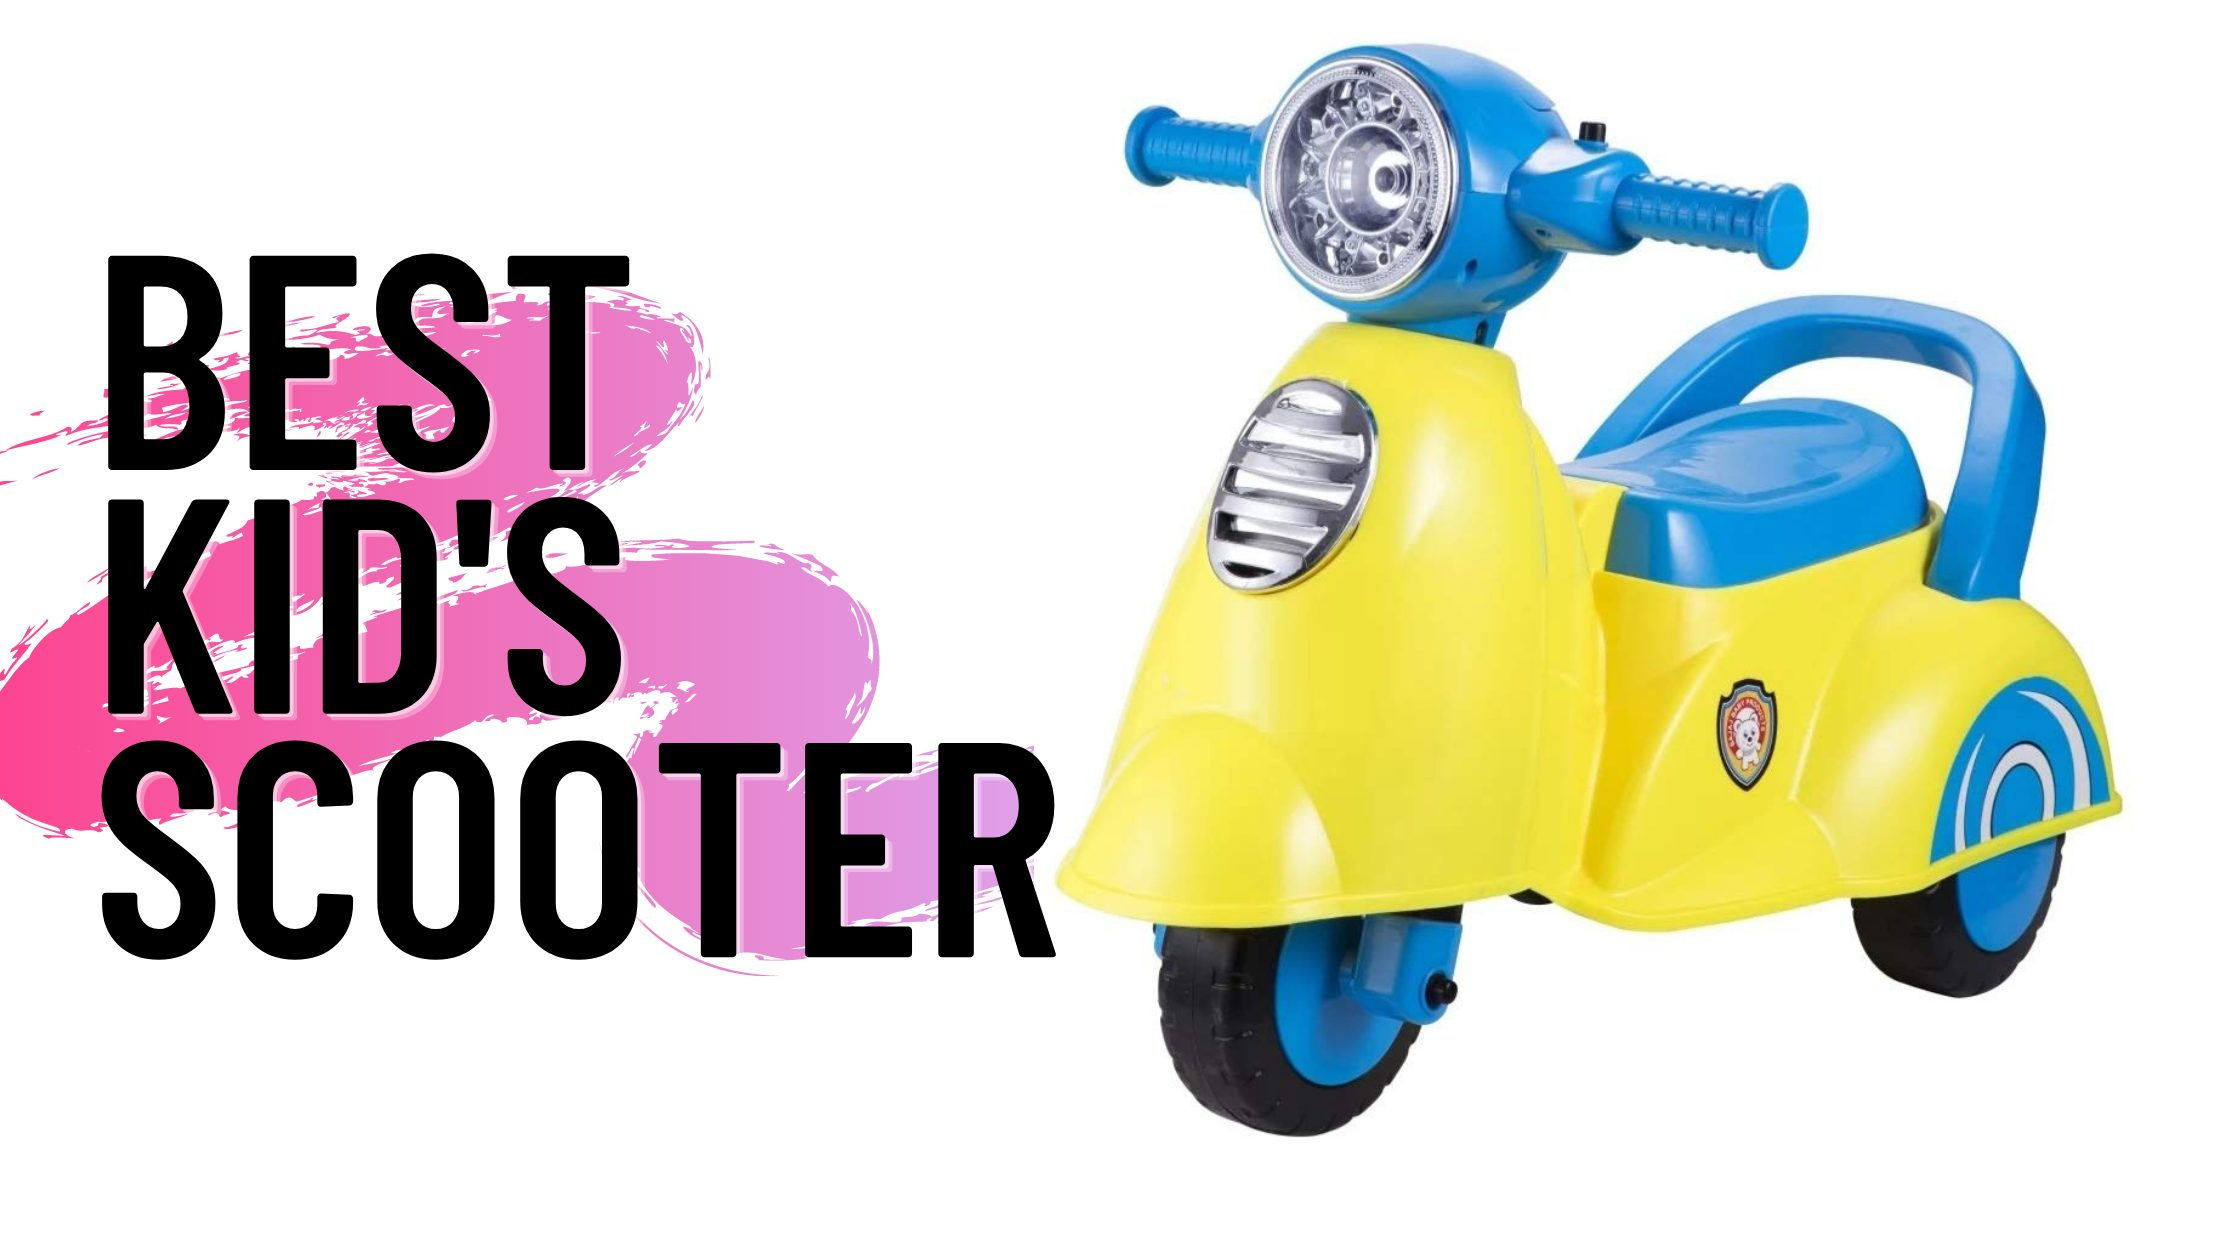 Best Kid's Scooter